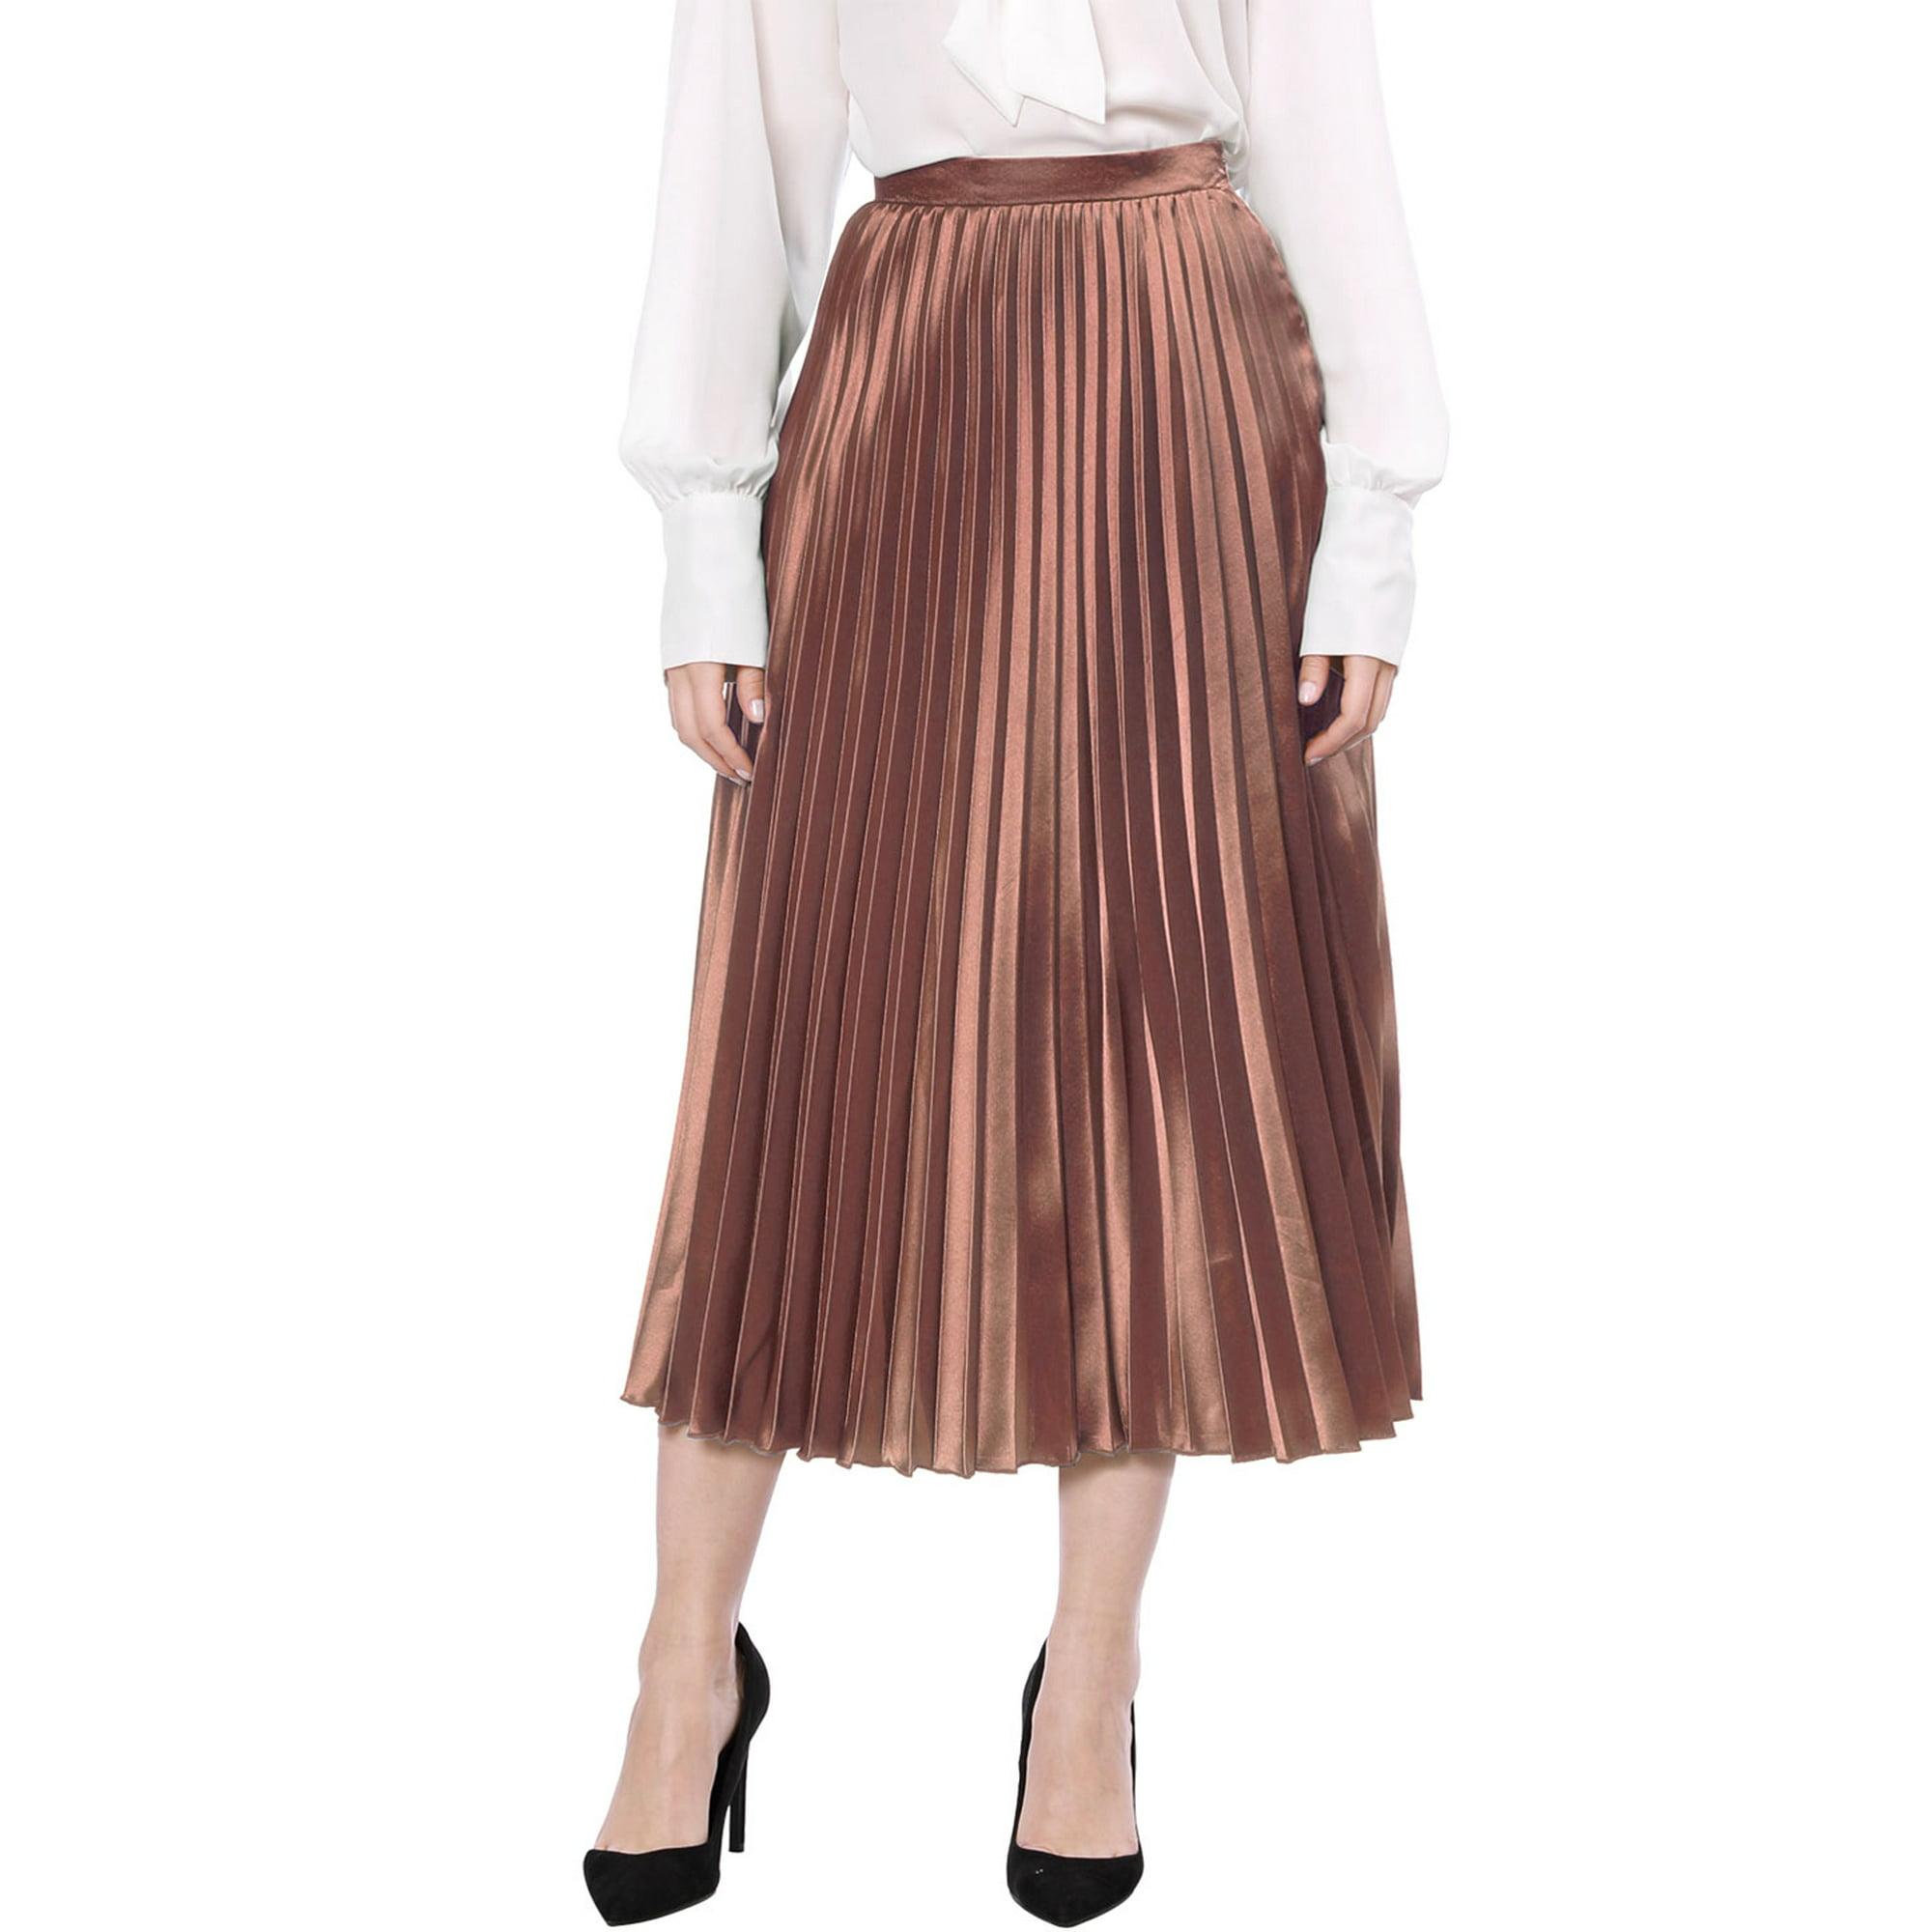 a8ea579b5 Allegra K Women Accordion Pleats Metallic Midi Skirt Copper L | Walmart  Canada